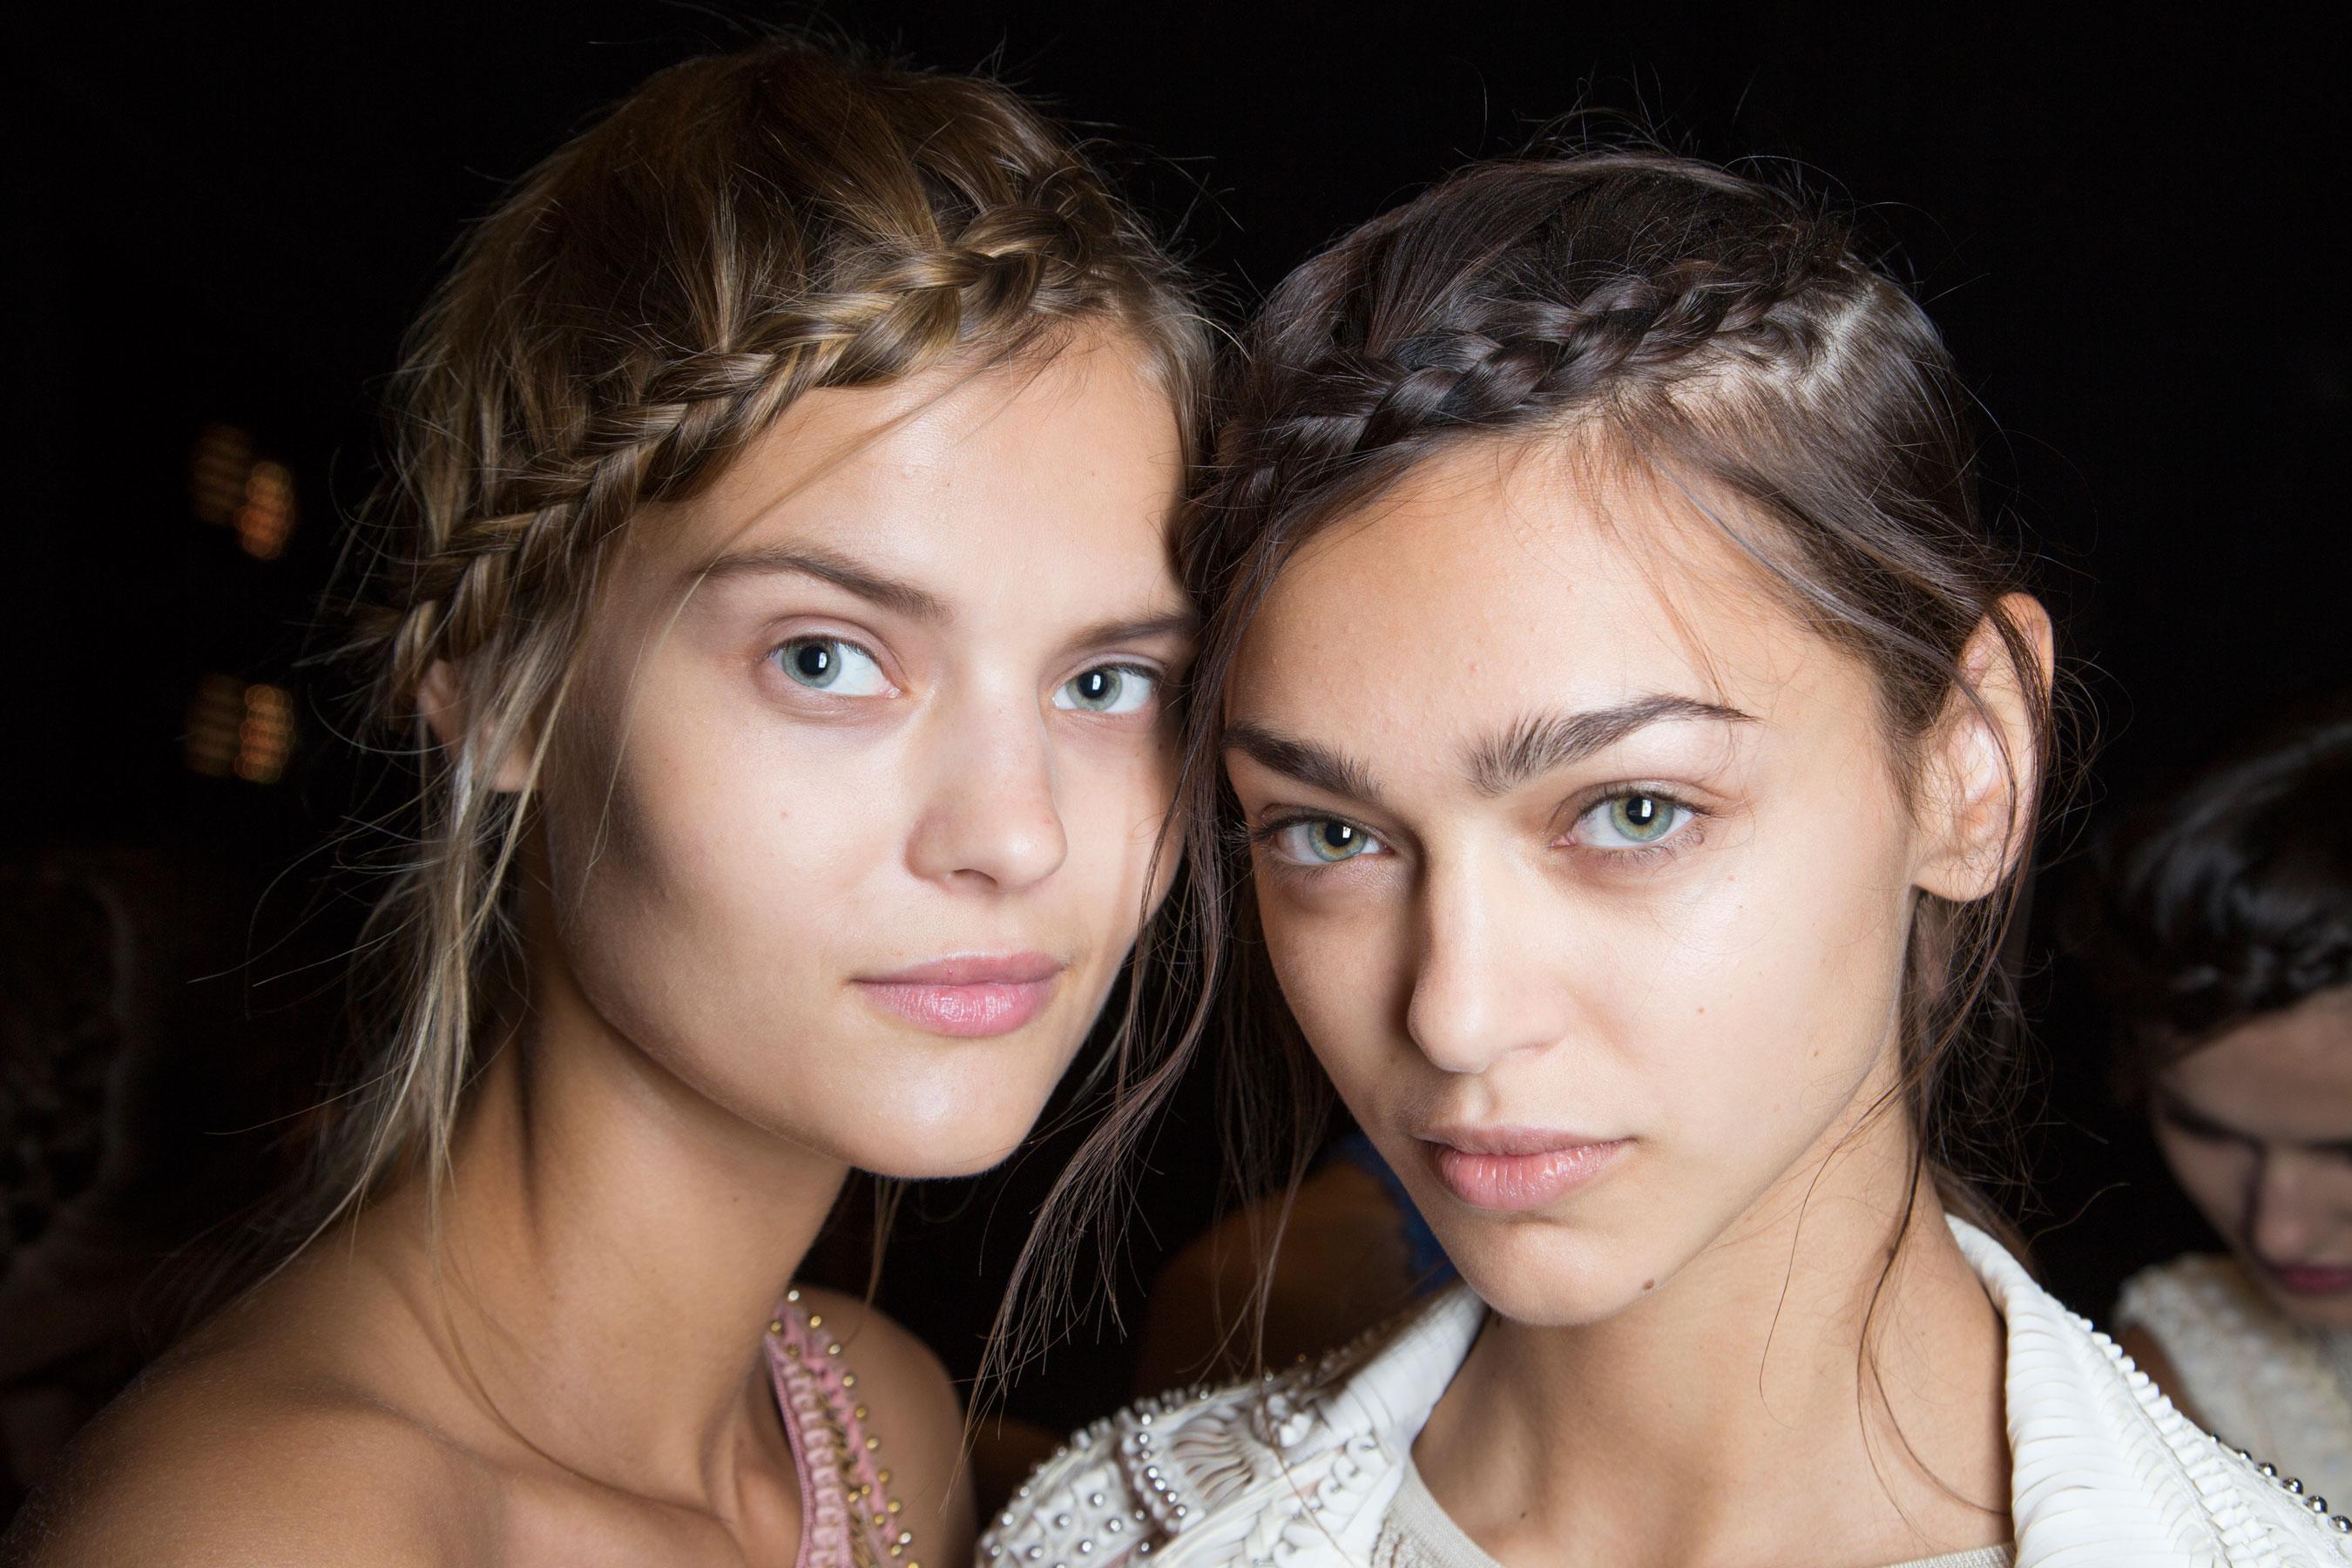 Herve-Leger-backstage-beauty-spring-2016-fashion-show-the-impression-87